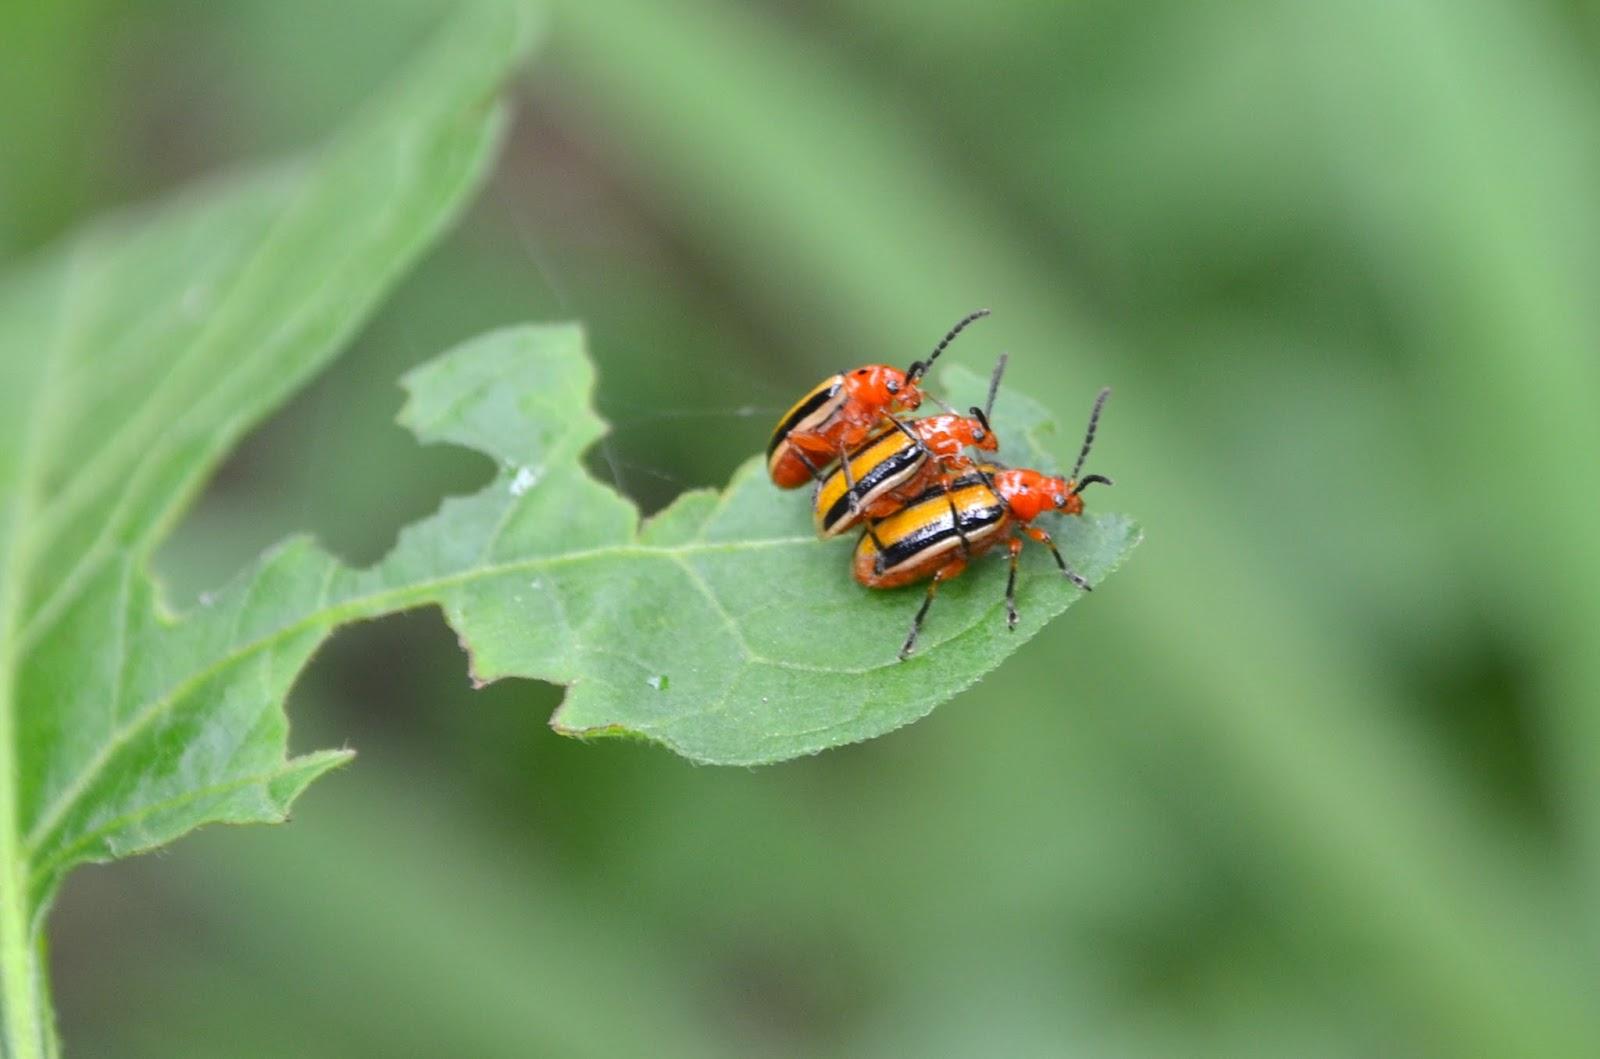 Three-lined Potato Beetles, Lema daturaphila